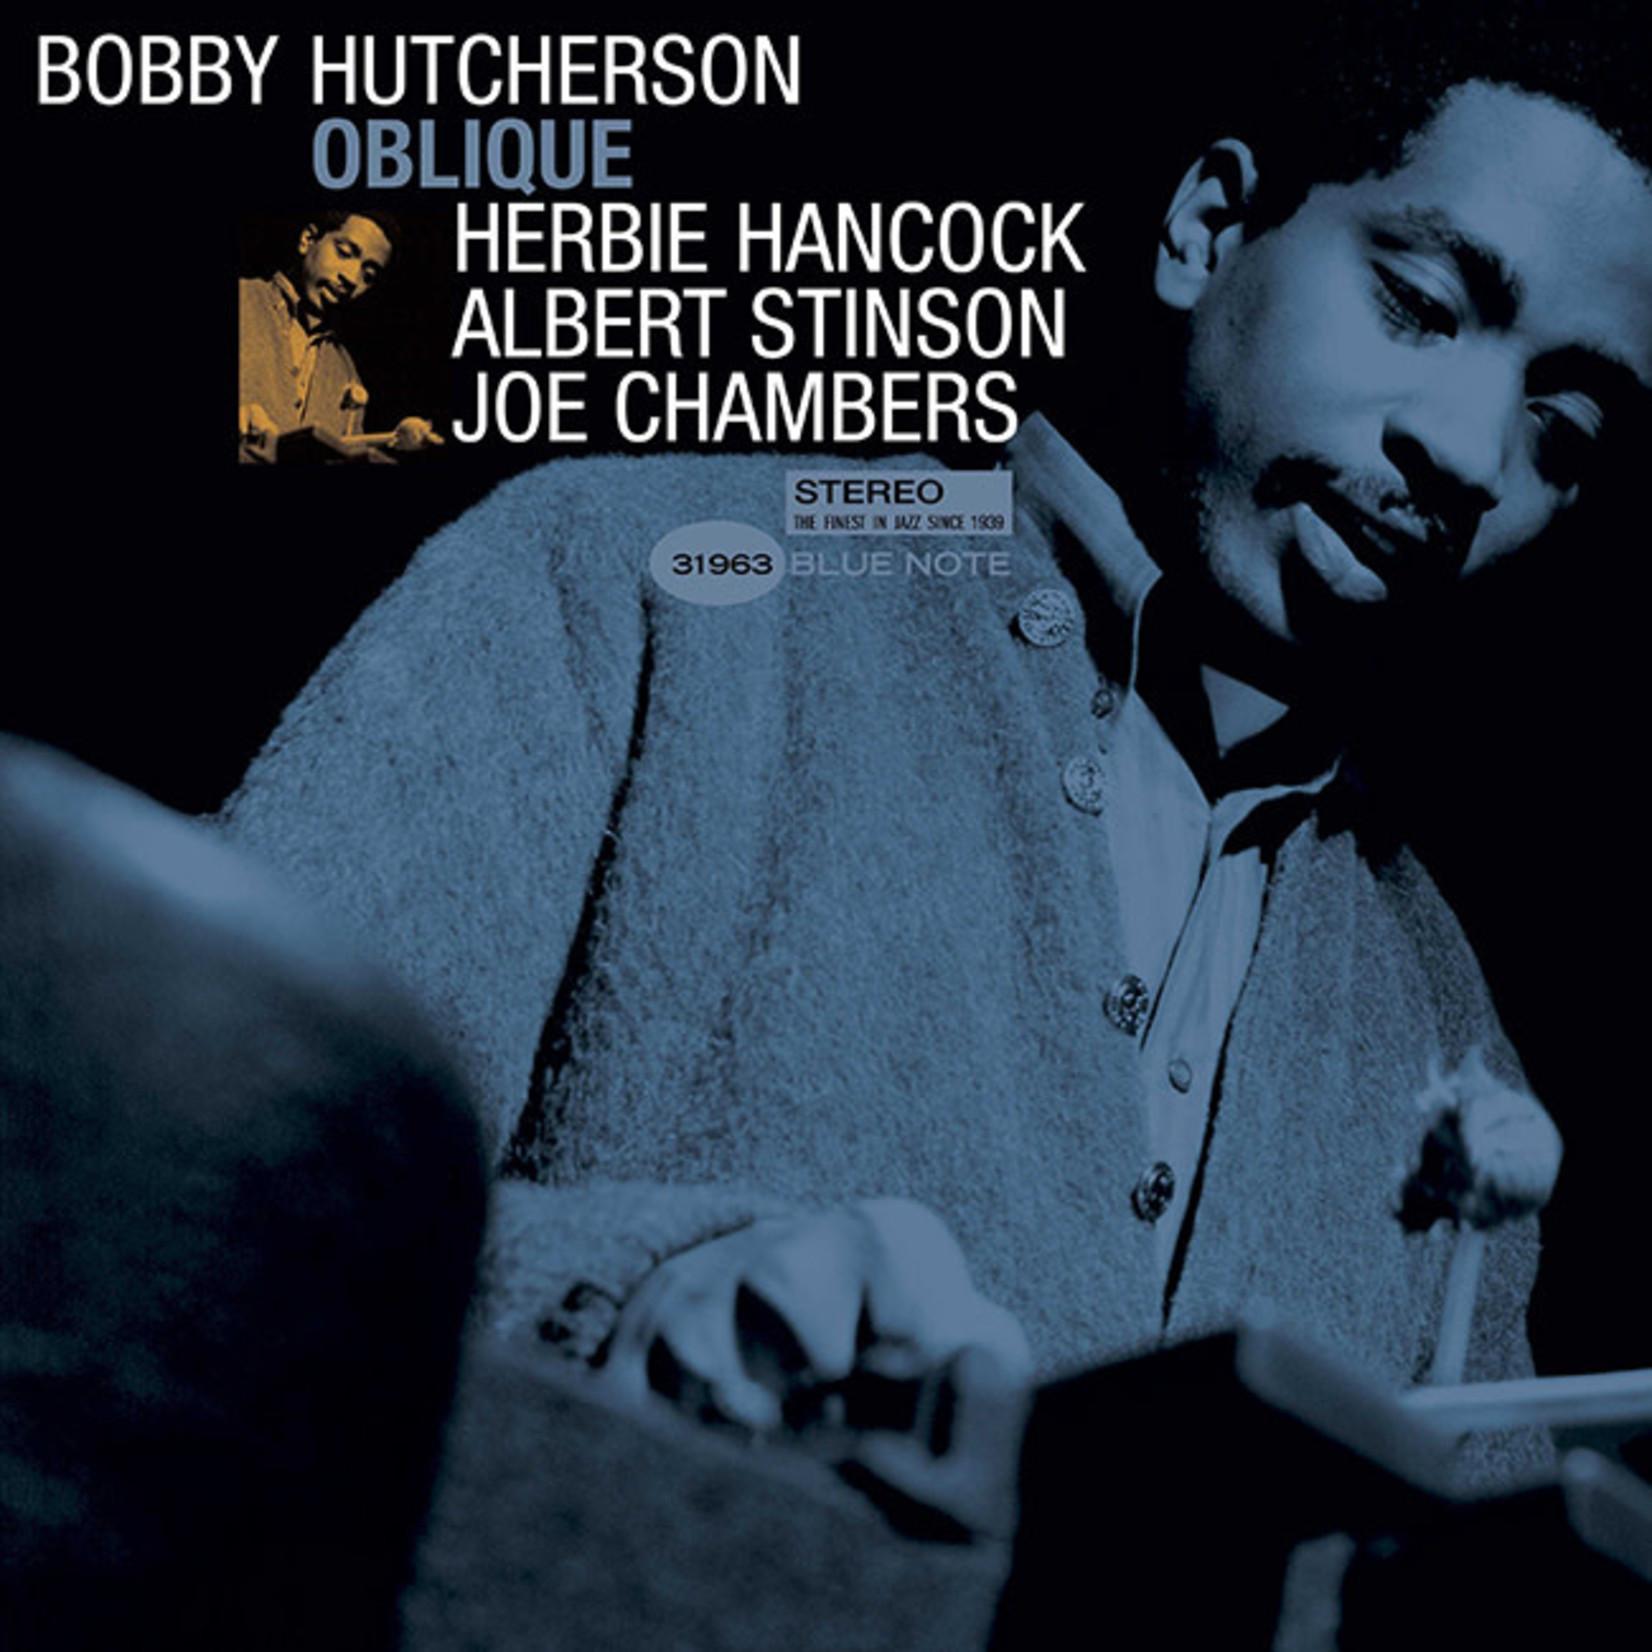 [New] Hutcherson, Bobby: Oblique (Tone Poet Series)